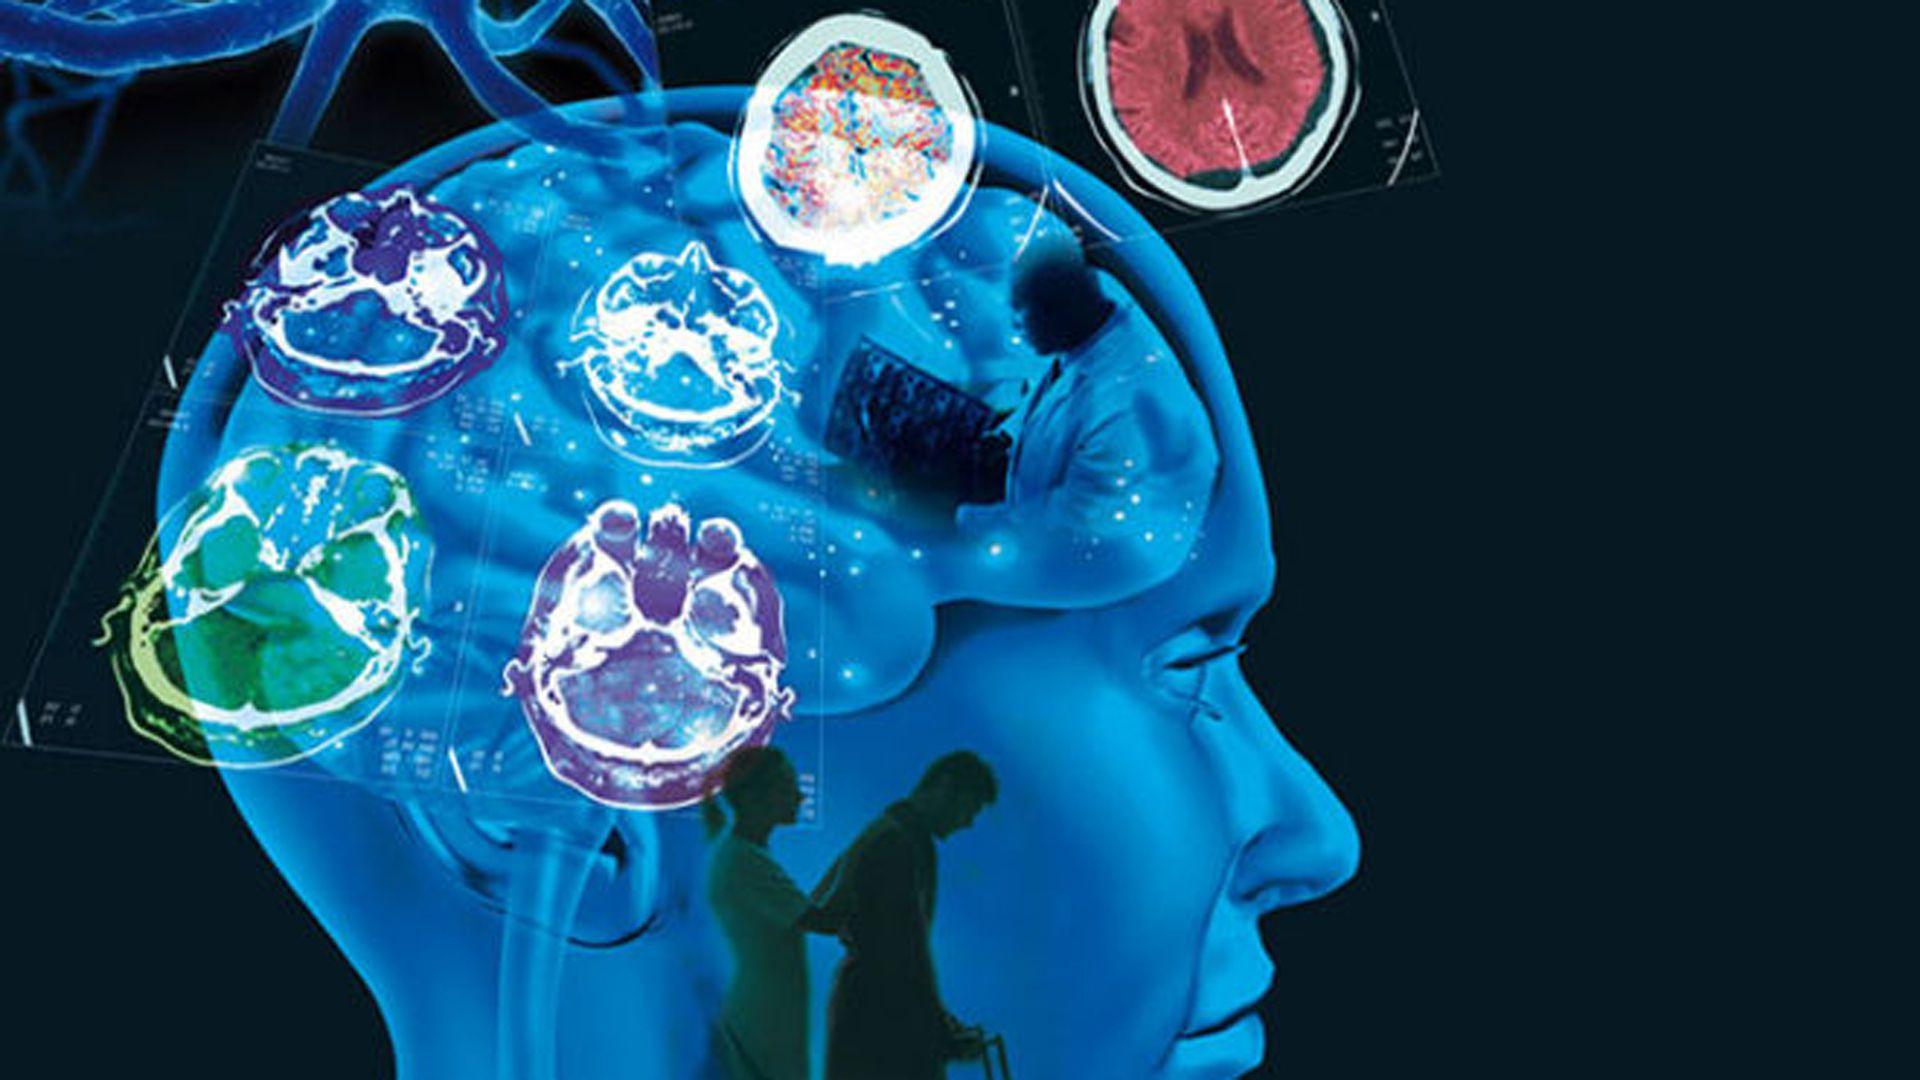 La EM es una enfermedad crónica e inflamatoria del sistema nervioso central